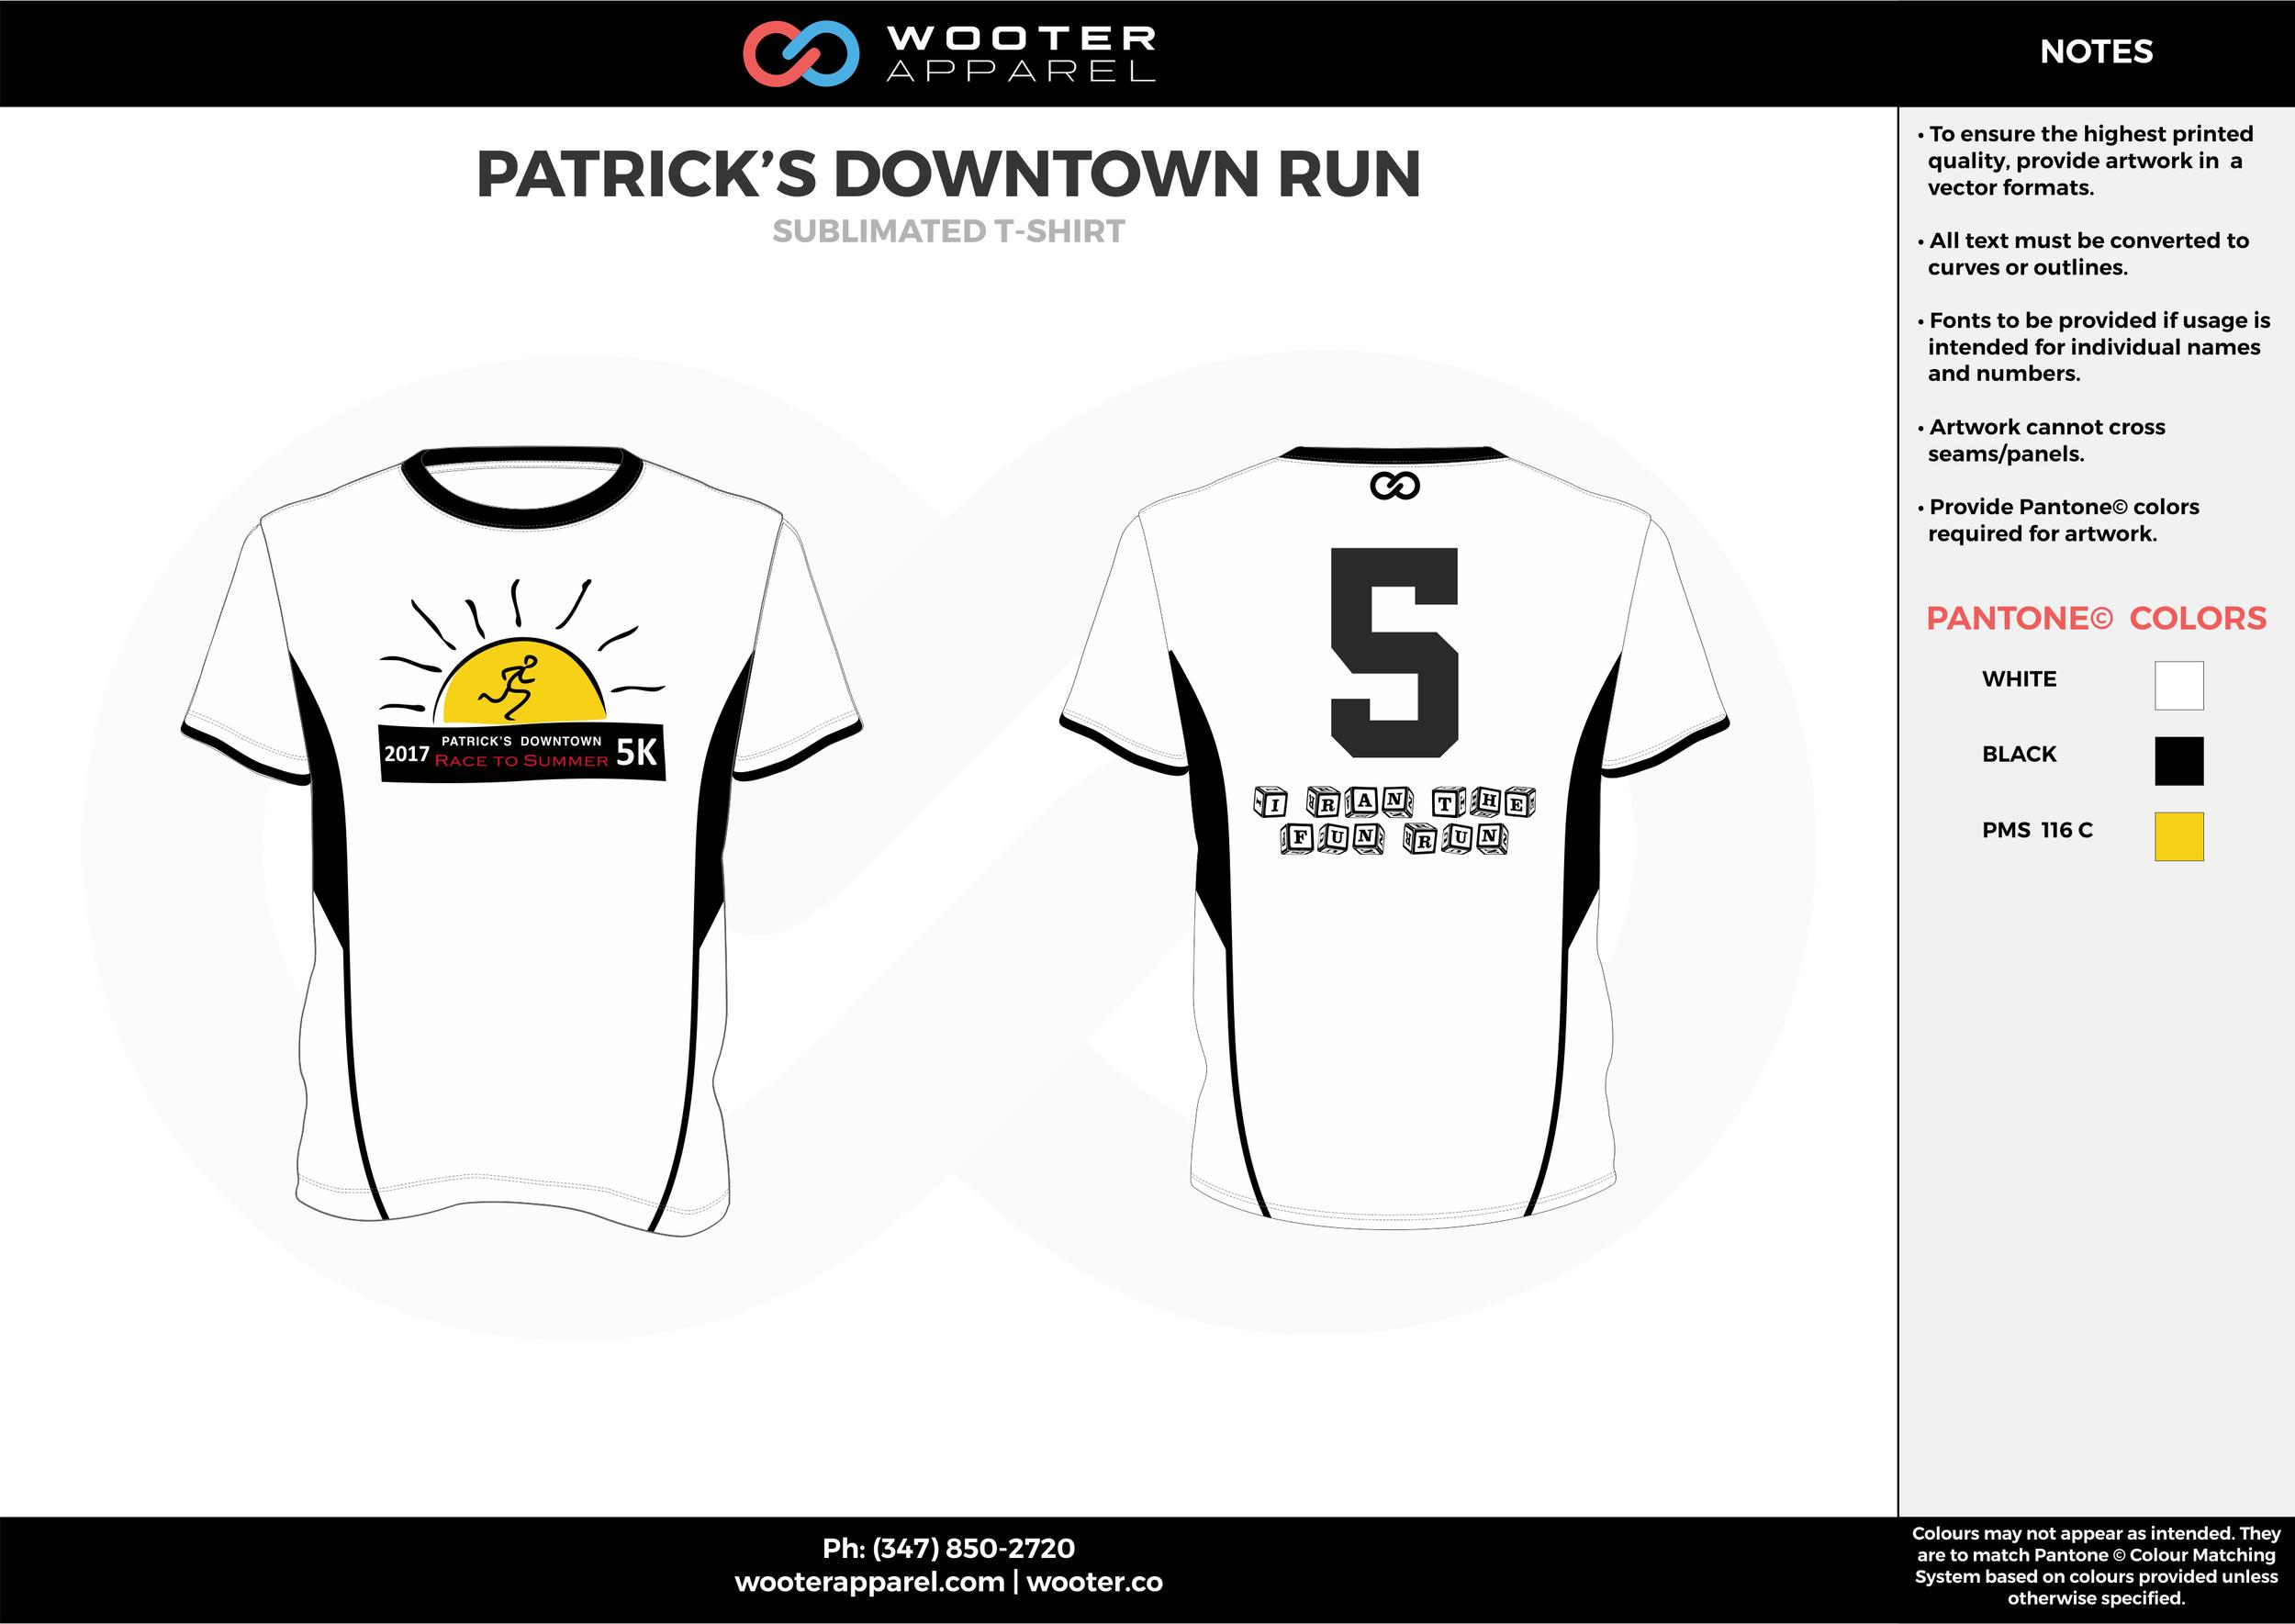 PATRICK'S DOWNTOWN RUN white black yellow custom design t-shirts